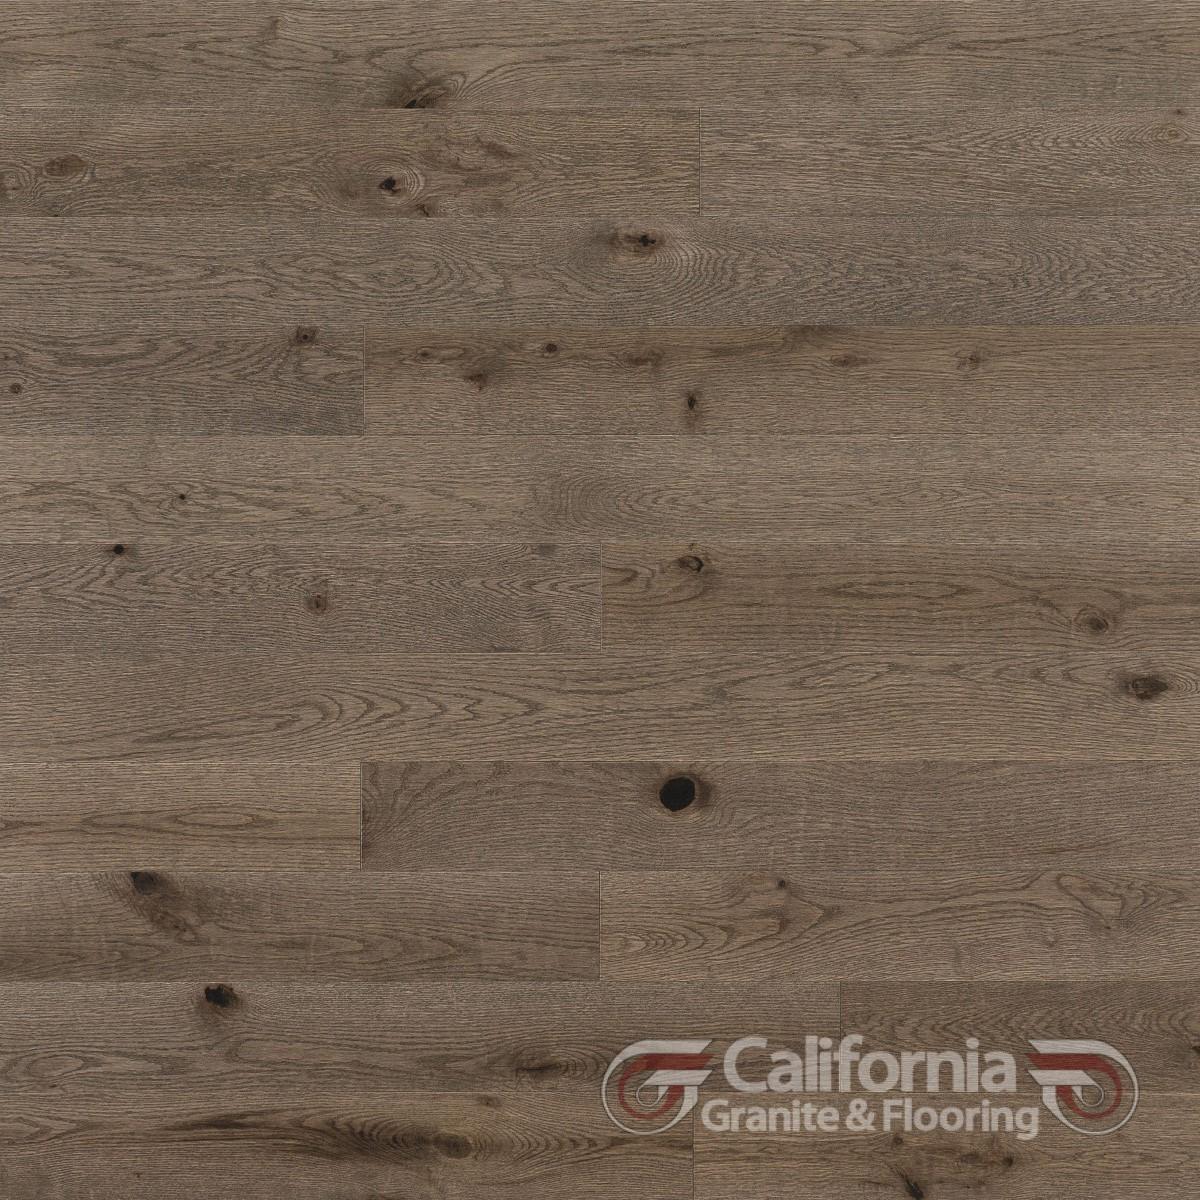 hardwood-flooring-red-oak-barn-wood-character-distressed-2